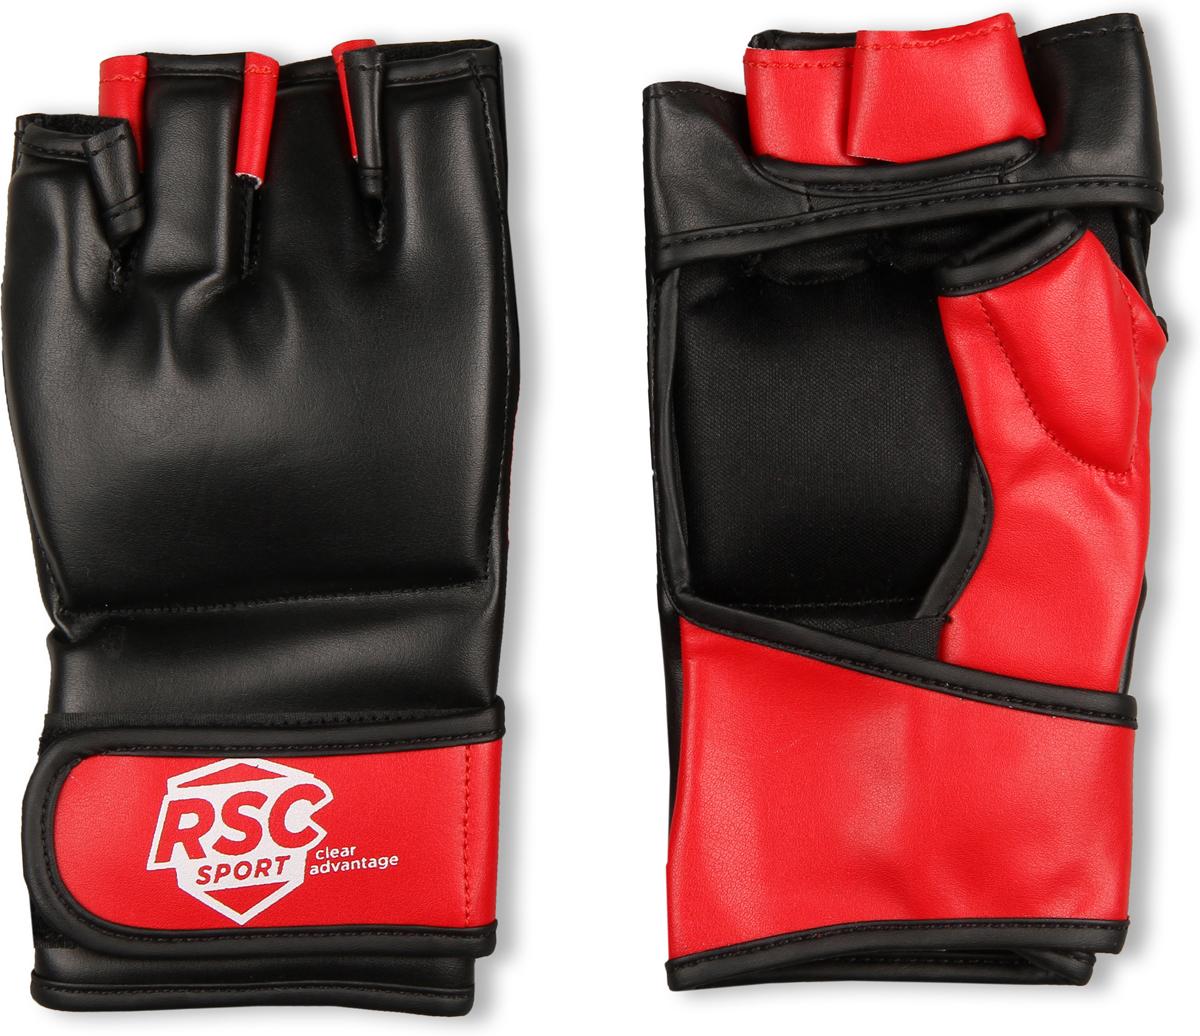 Перчатки ММА RSC PU BF-MM-4001, 00026603, красный, черный, размер XL шлем боксерский rsc pu bf bx 208 00026585 красный размер xl